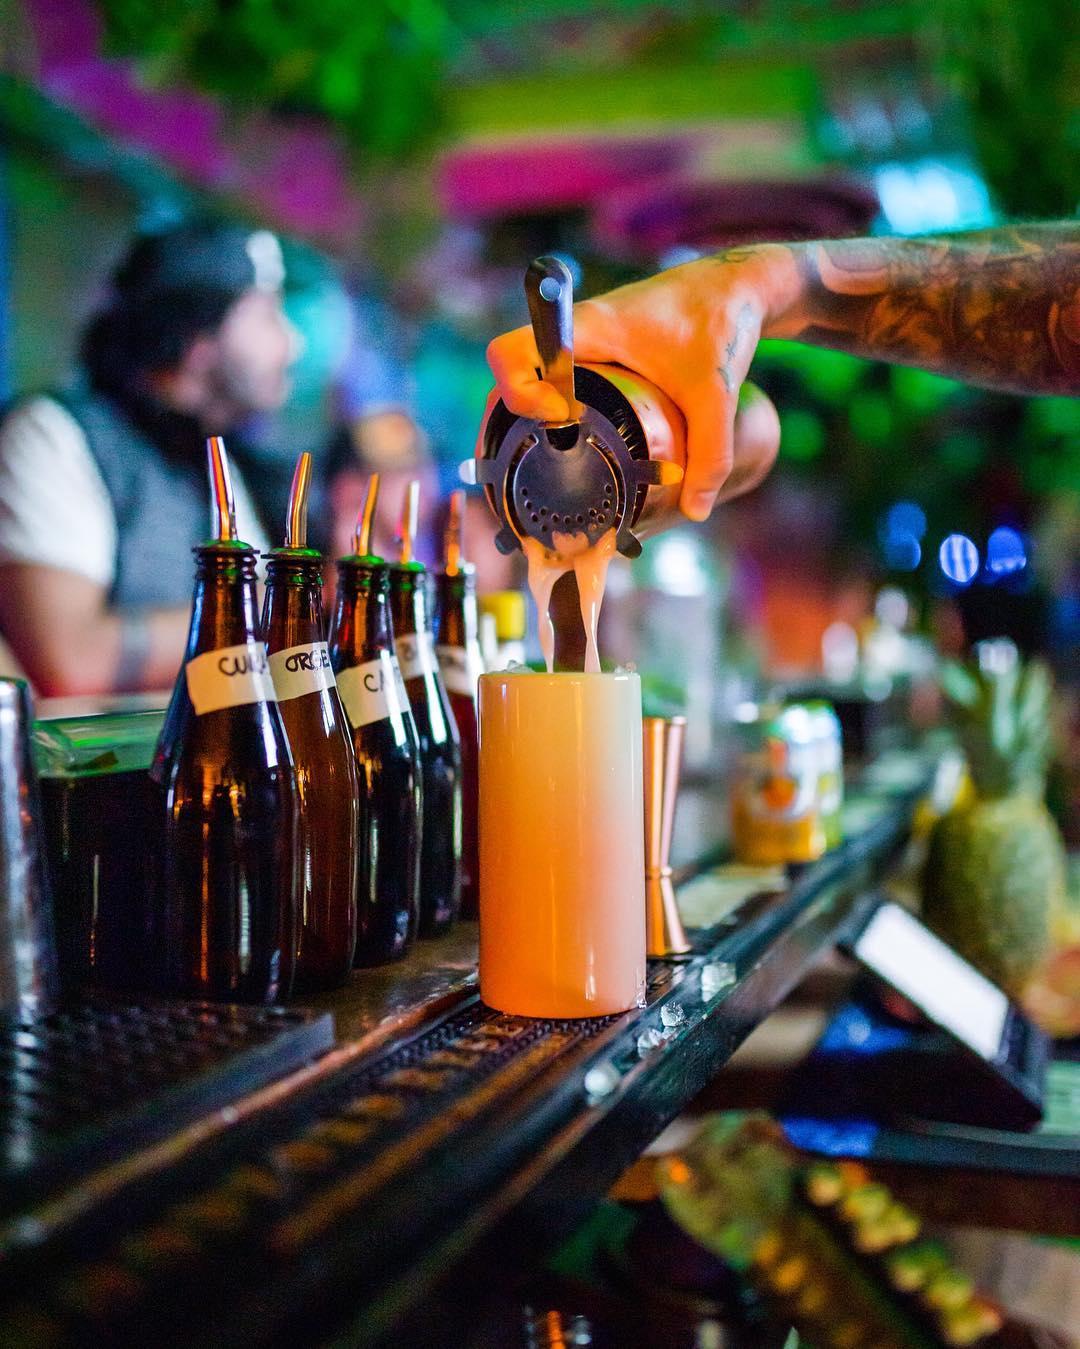 mecca otr drinks and bar